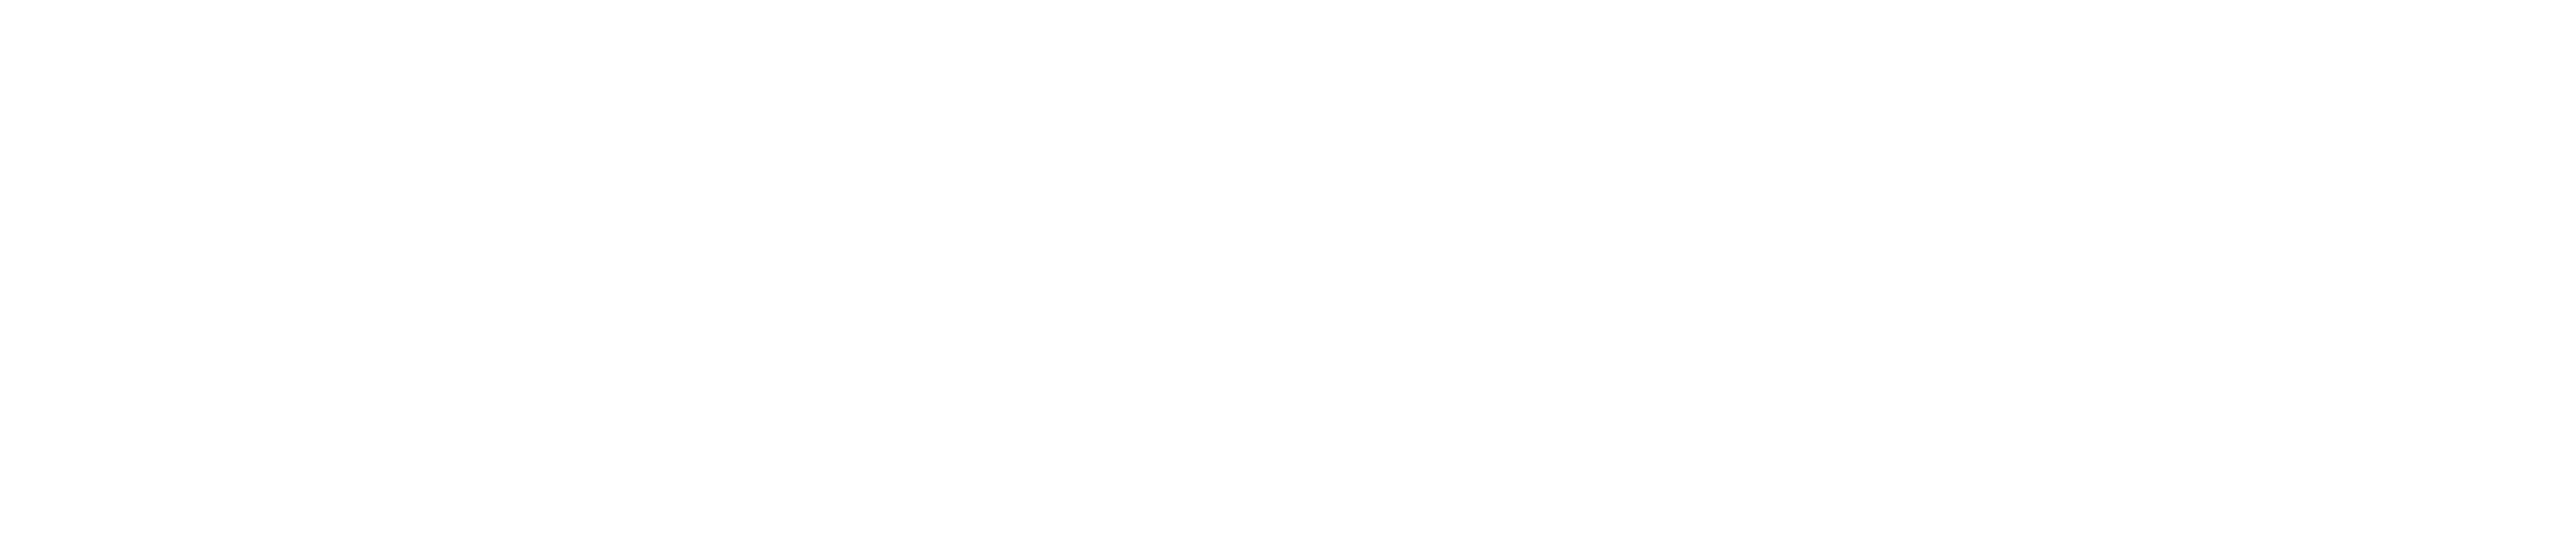 Loopascoop logo